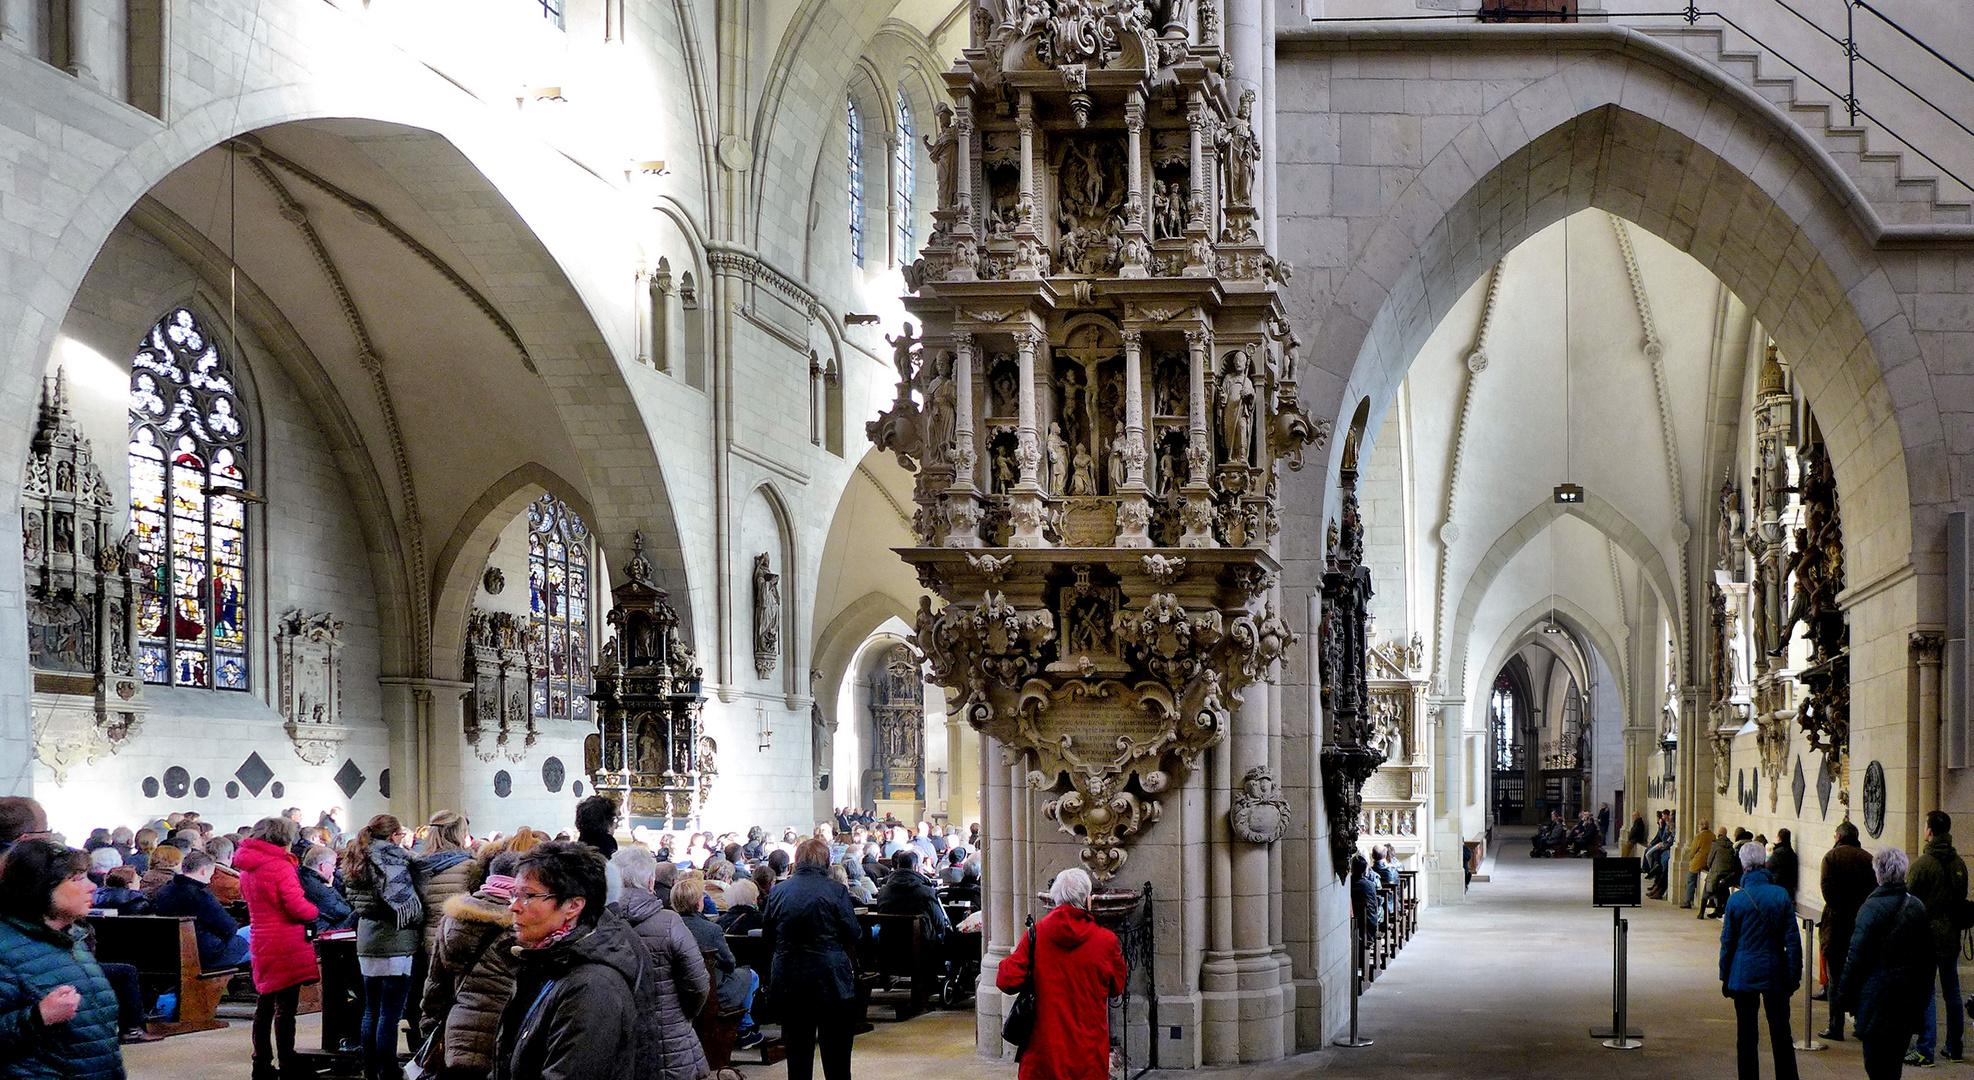 Messe im St. Paulus Dom Münster